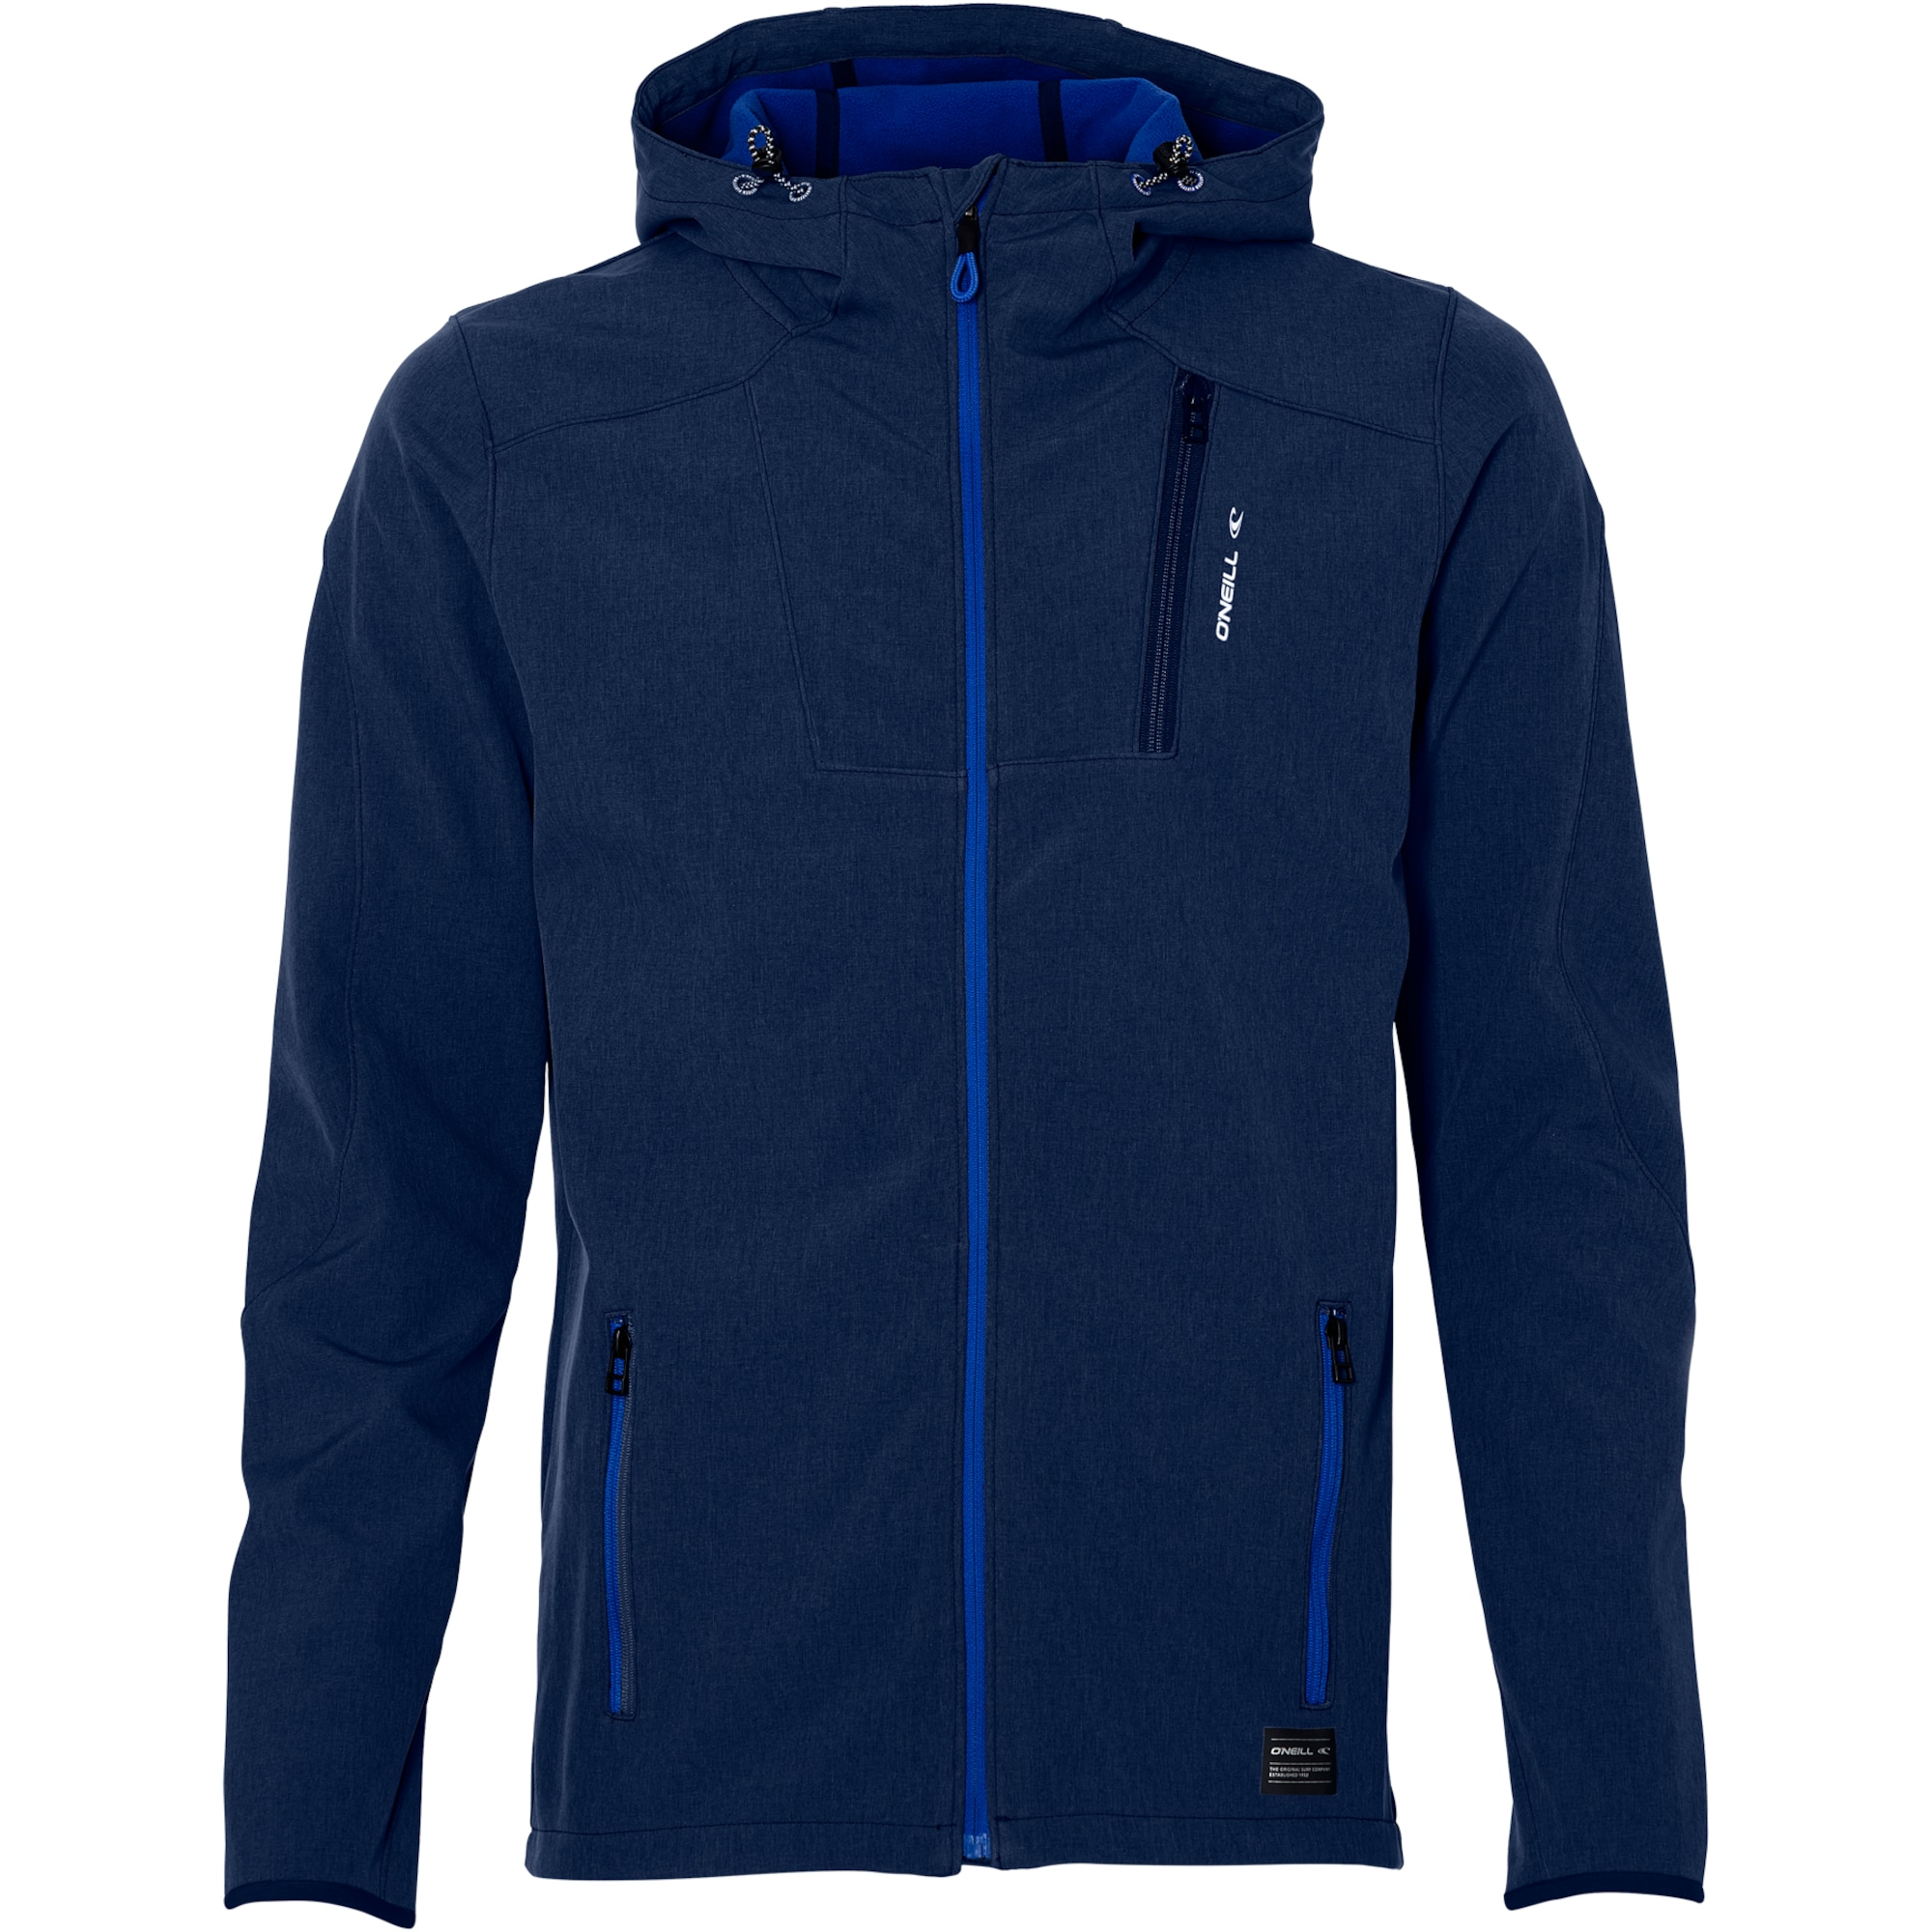 ONEILL Sportovní bunda tmavě modrá O'NEILL